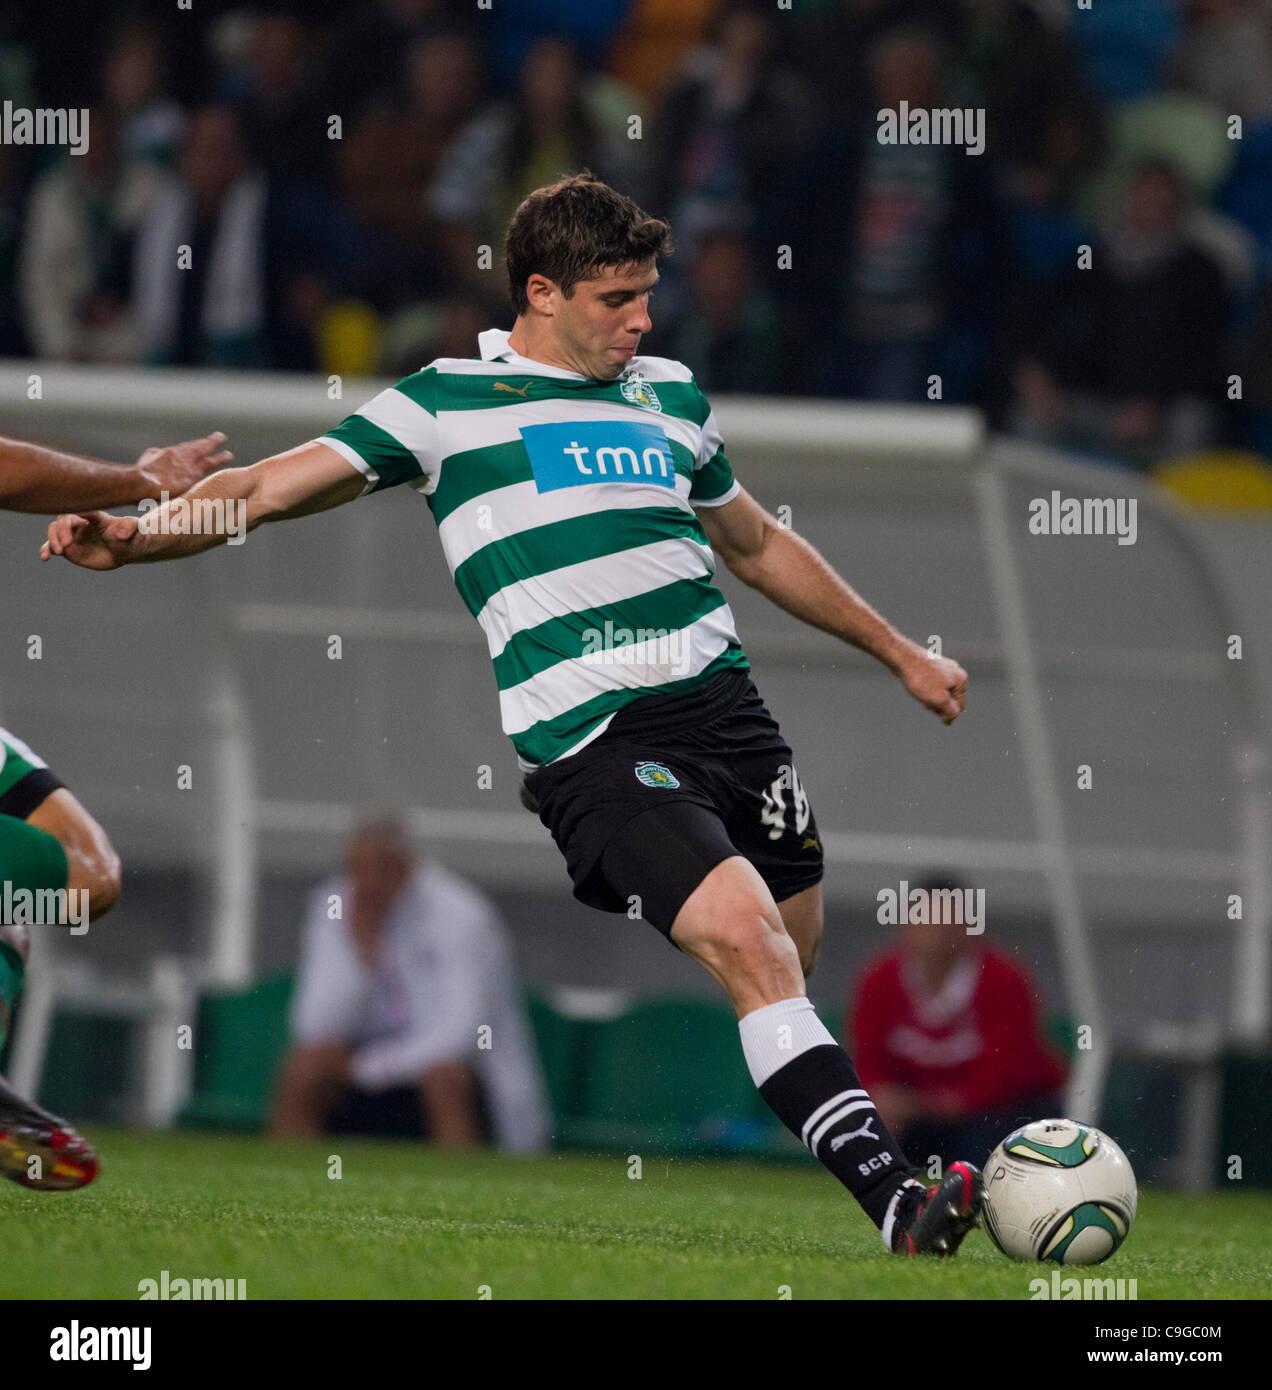 Portugal Cup Quarter final - Sporting CP (SCP) x SC Maritimo (SCM)  Insua Sporting Clube Portugal Defender shooting Stock Photo